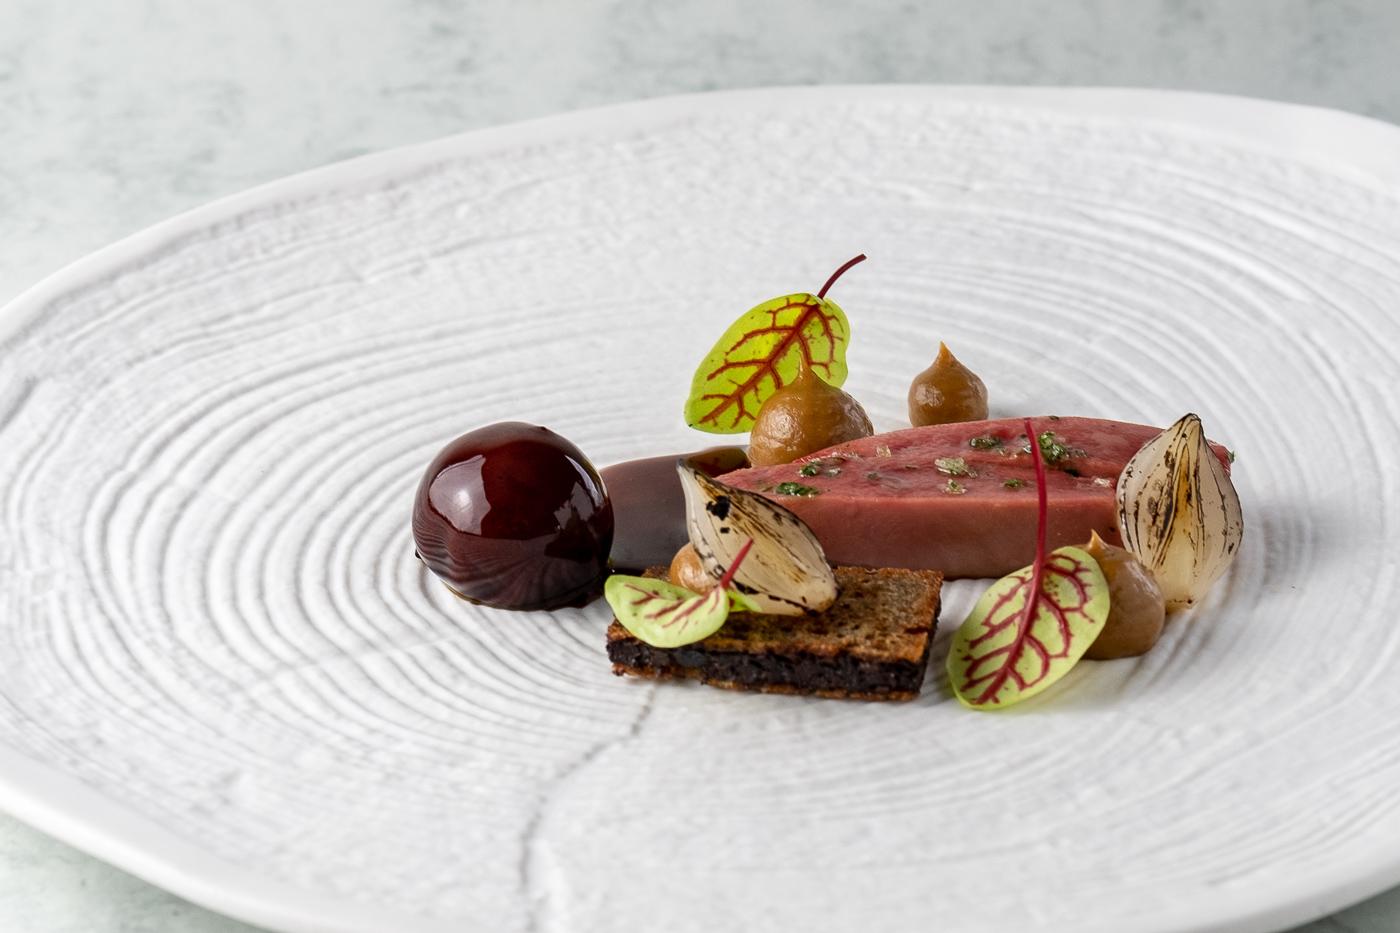 tooktook-photography-gastronomy-food-beverages-experiences-restaurants-131.jpg